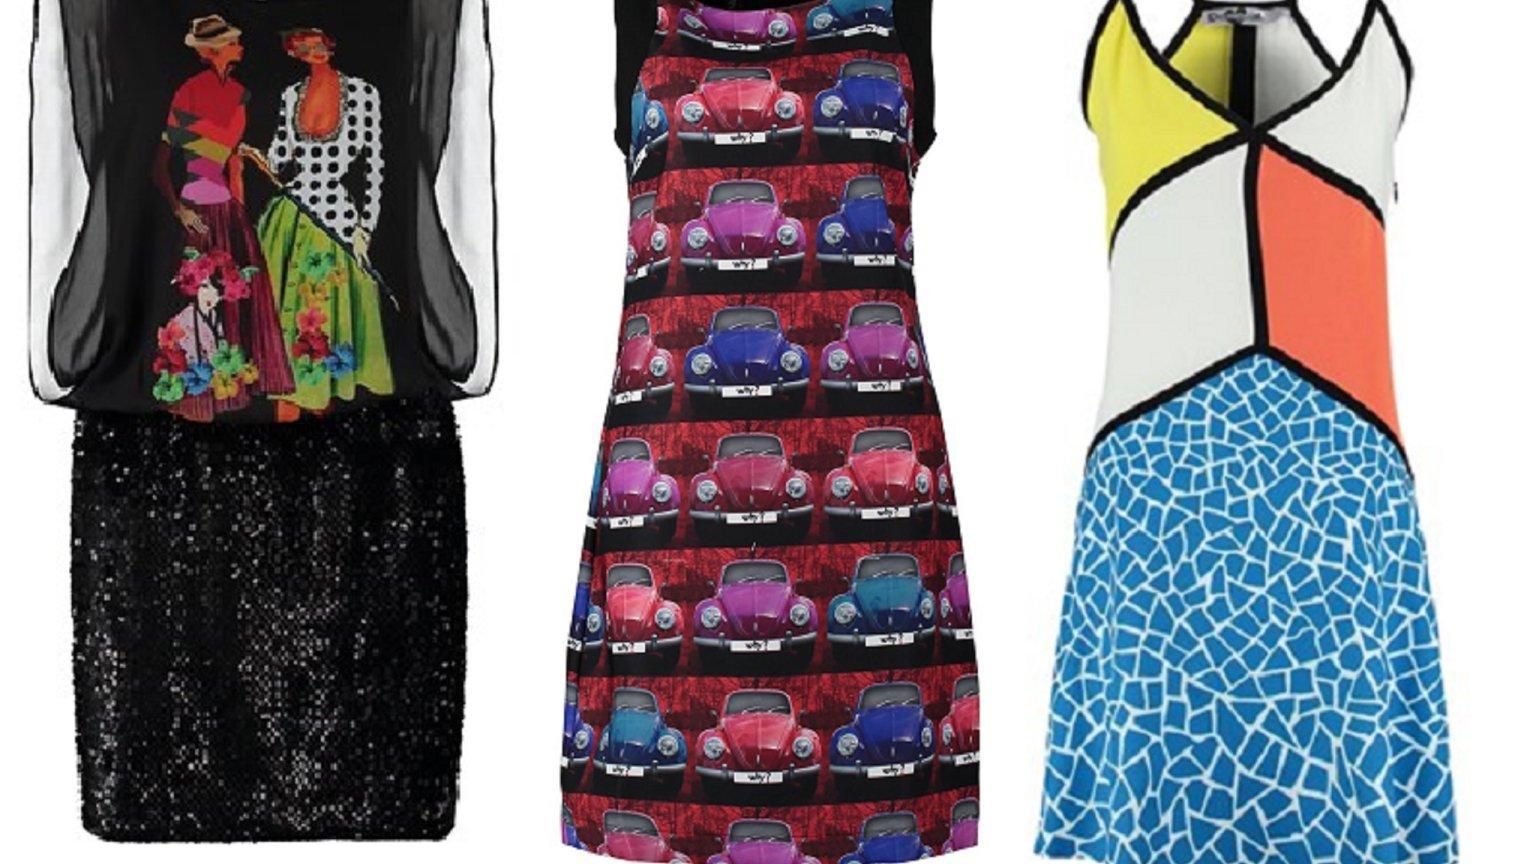 f7891873a3 Oryginalne sukienki Desigual - musisz je mieć!